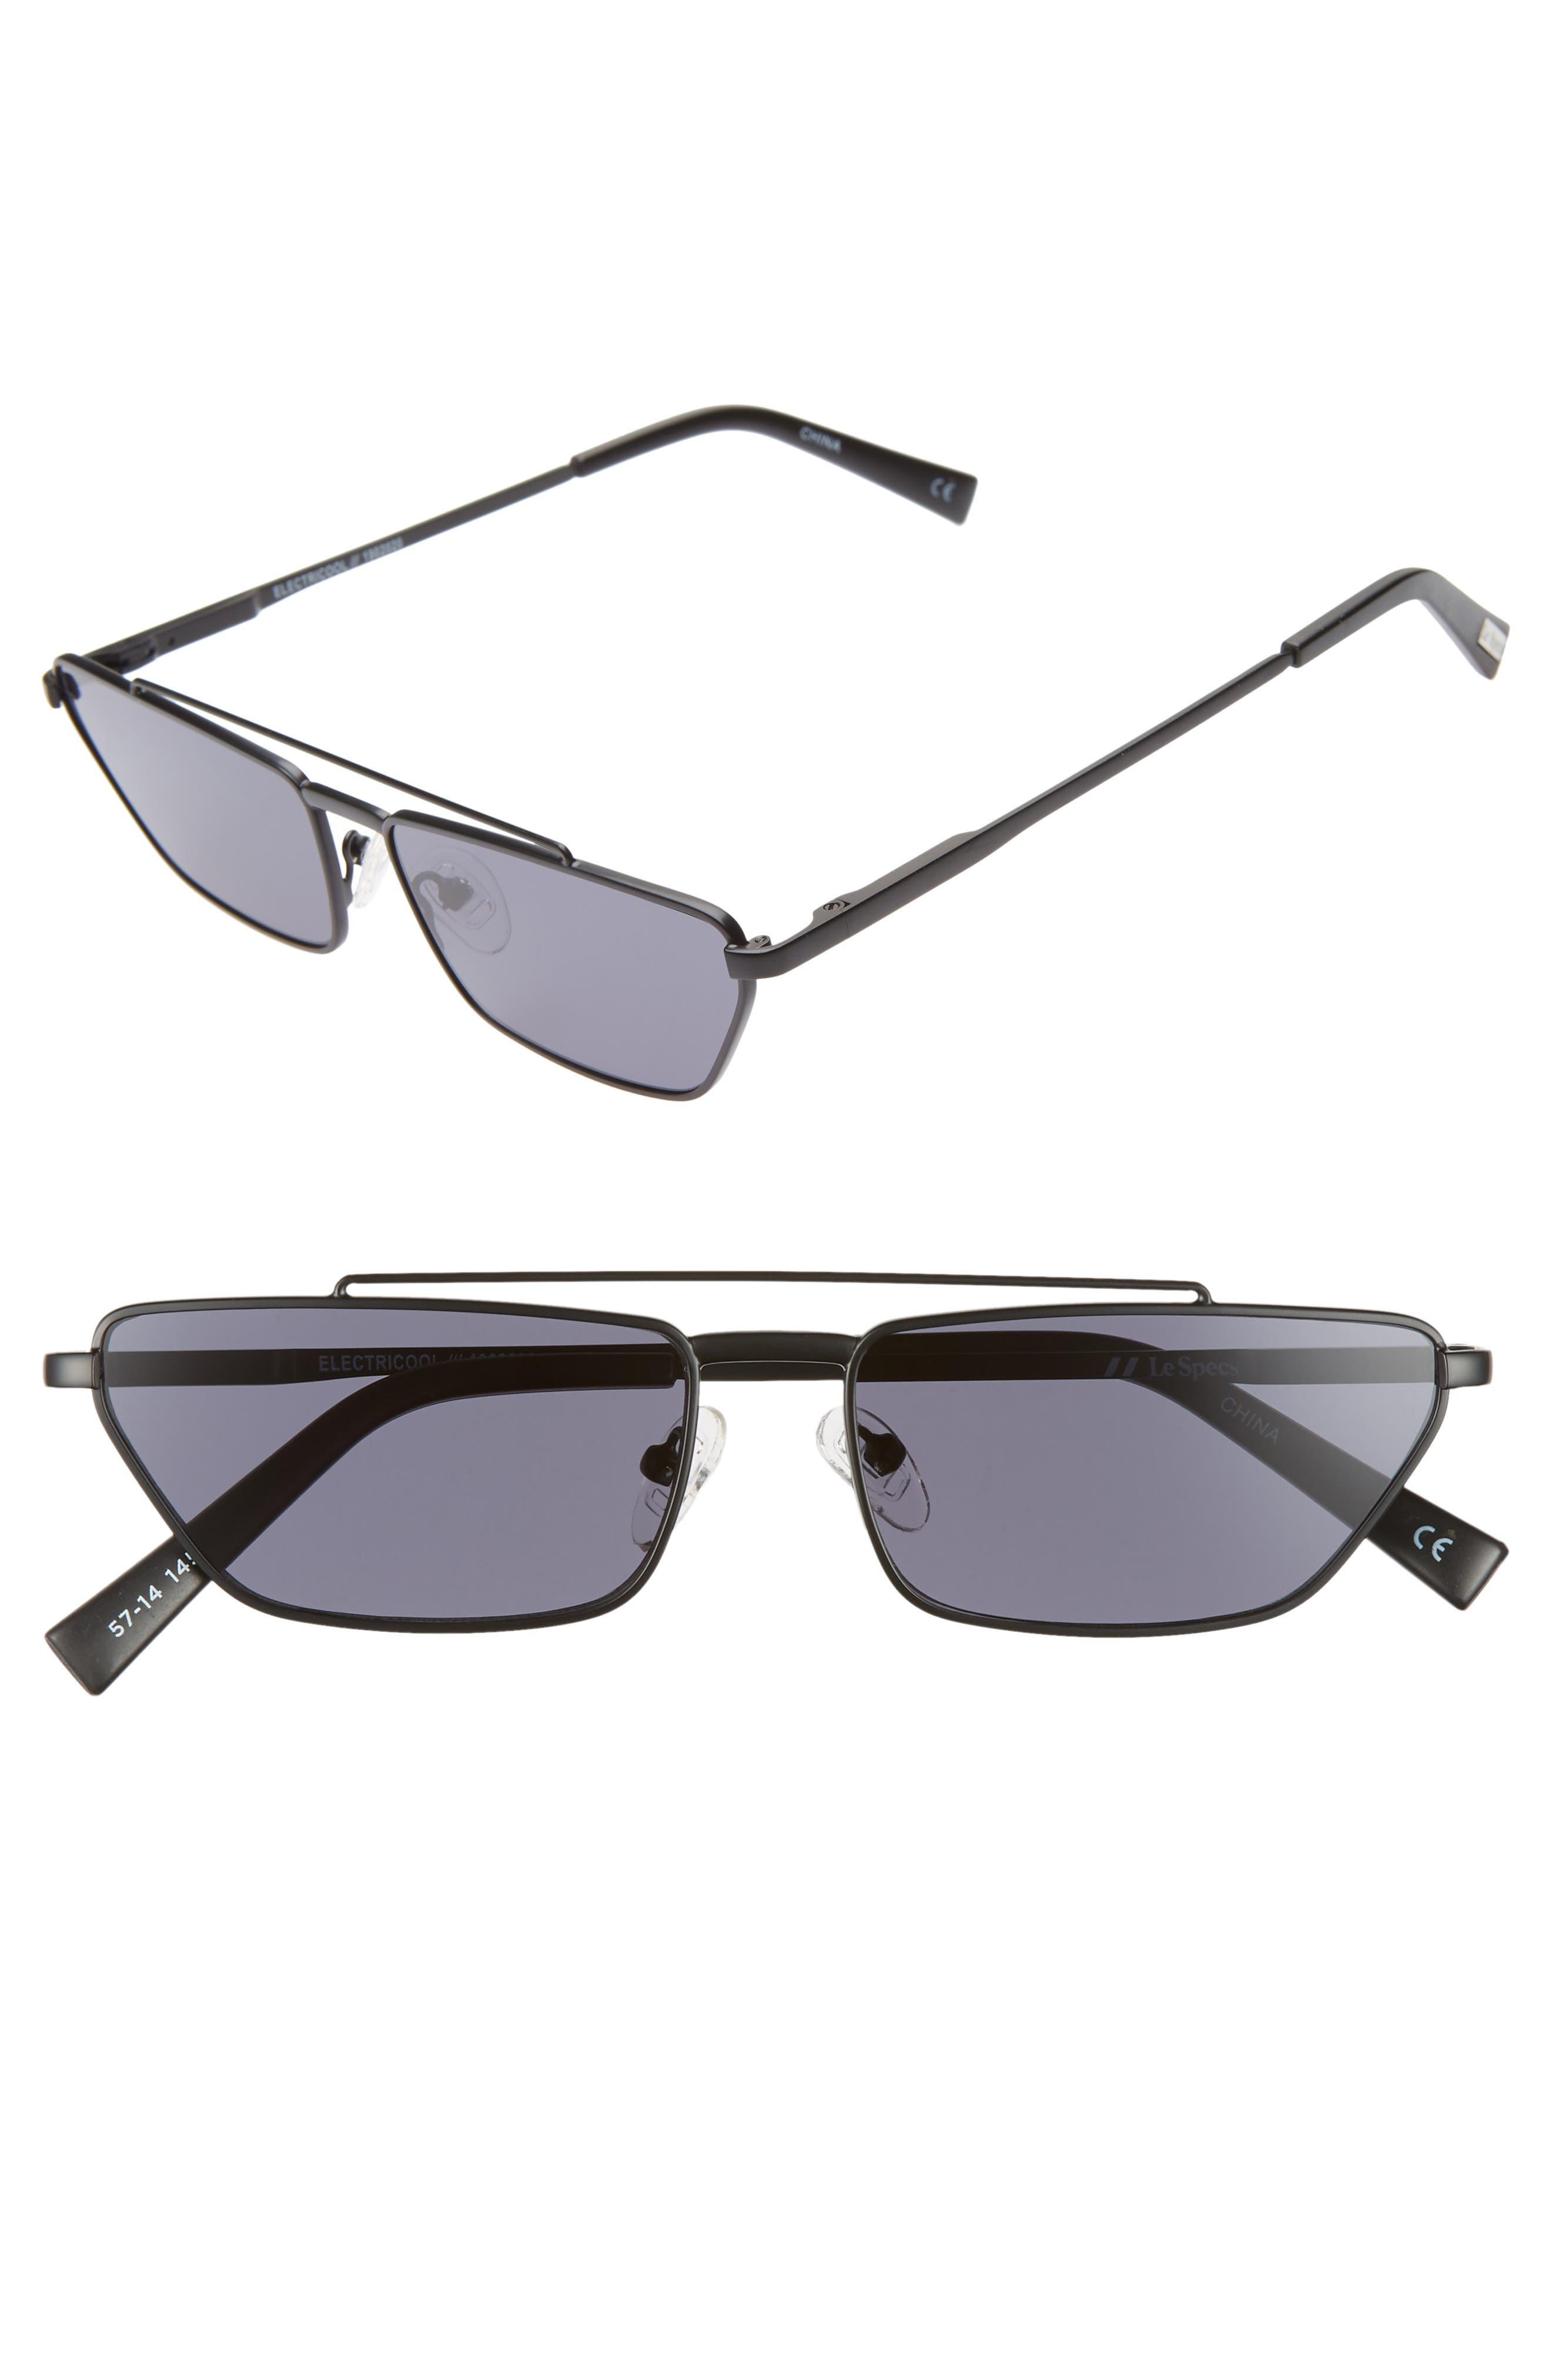 Le Specs Electricool 57Mm Cat Eye Aviator Sunglasses - Matte Black/ Smoke